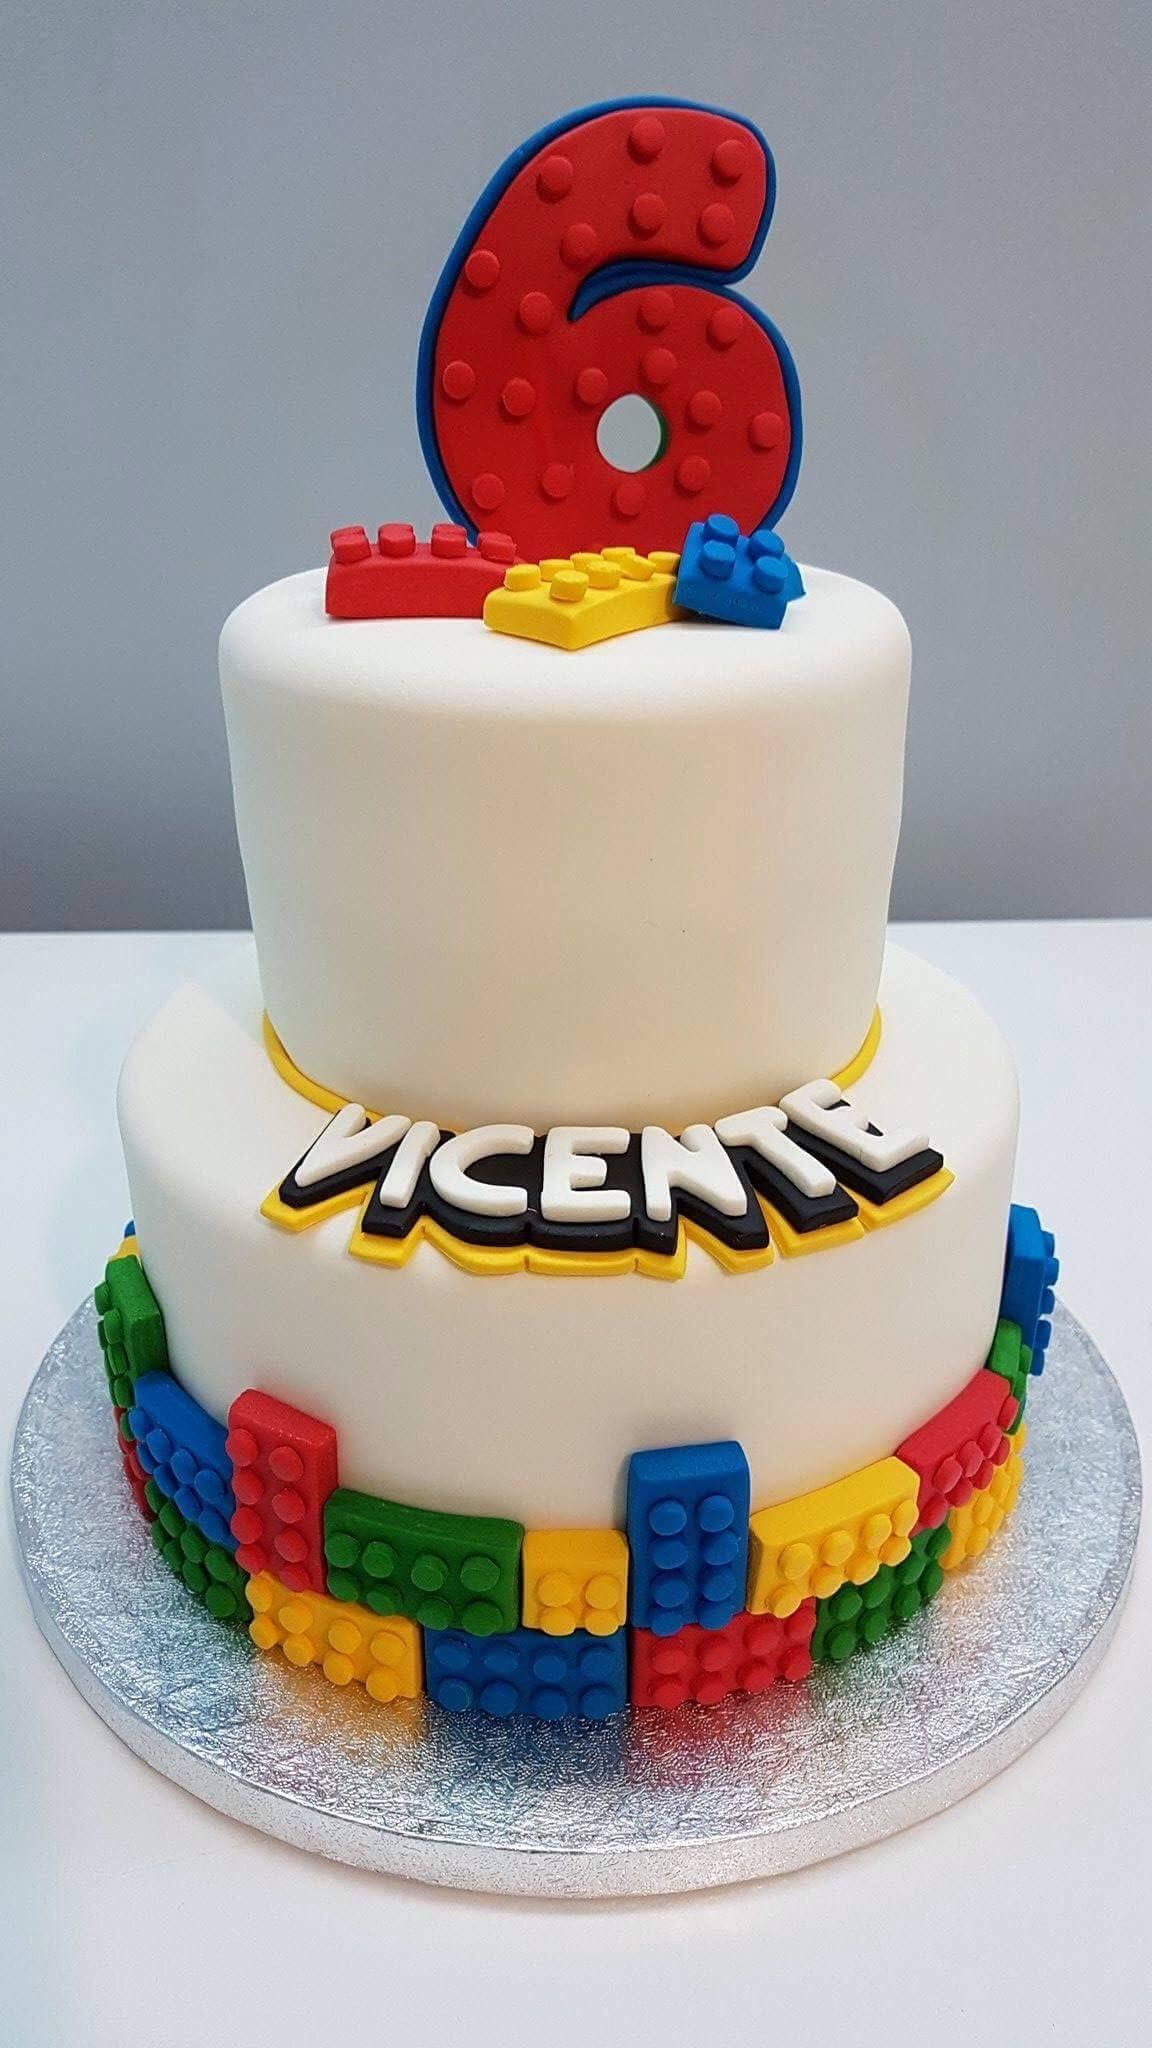 Wondrous Bolo Lego 50 Ideias De Decoracao Incriveis Para A Festa Gift Funny Birthday Cards Online Alyptdamsfinfo